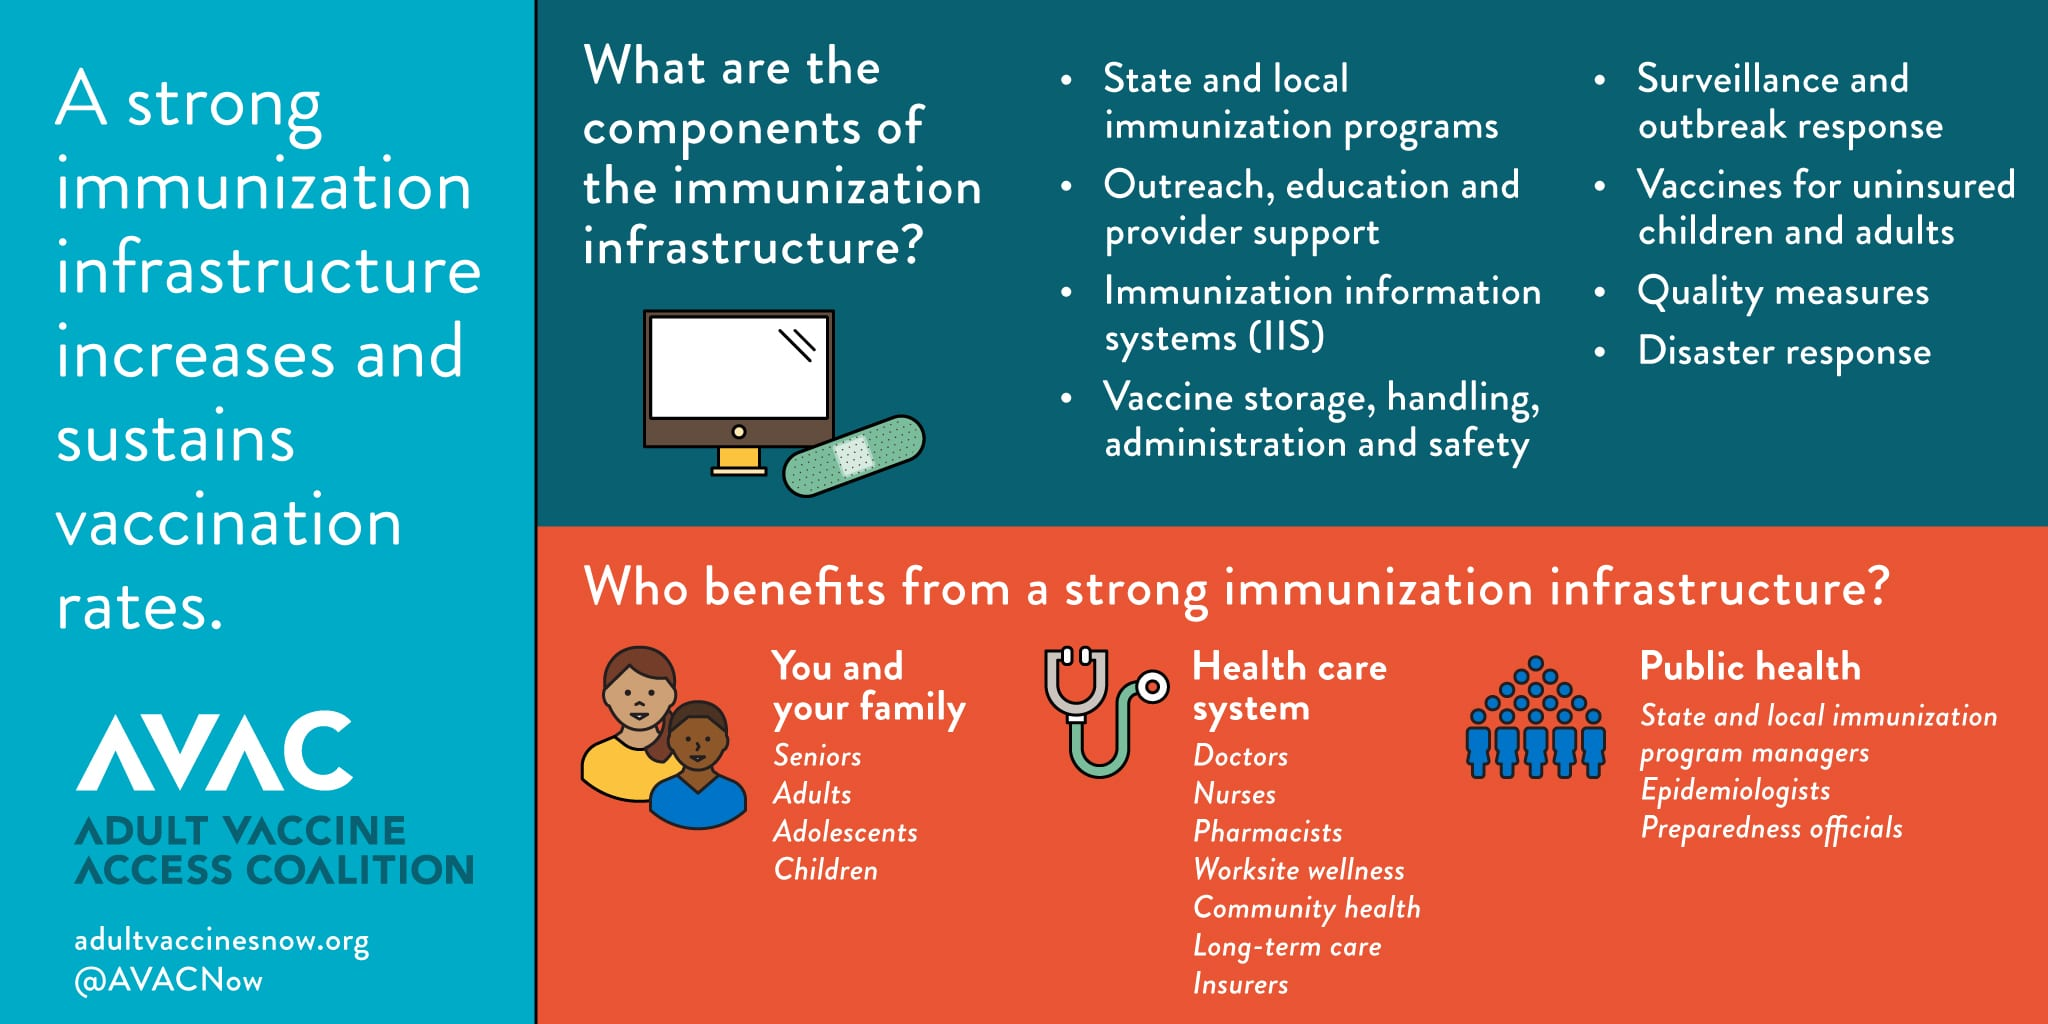 avac_immunization_infrastructure